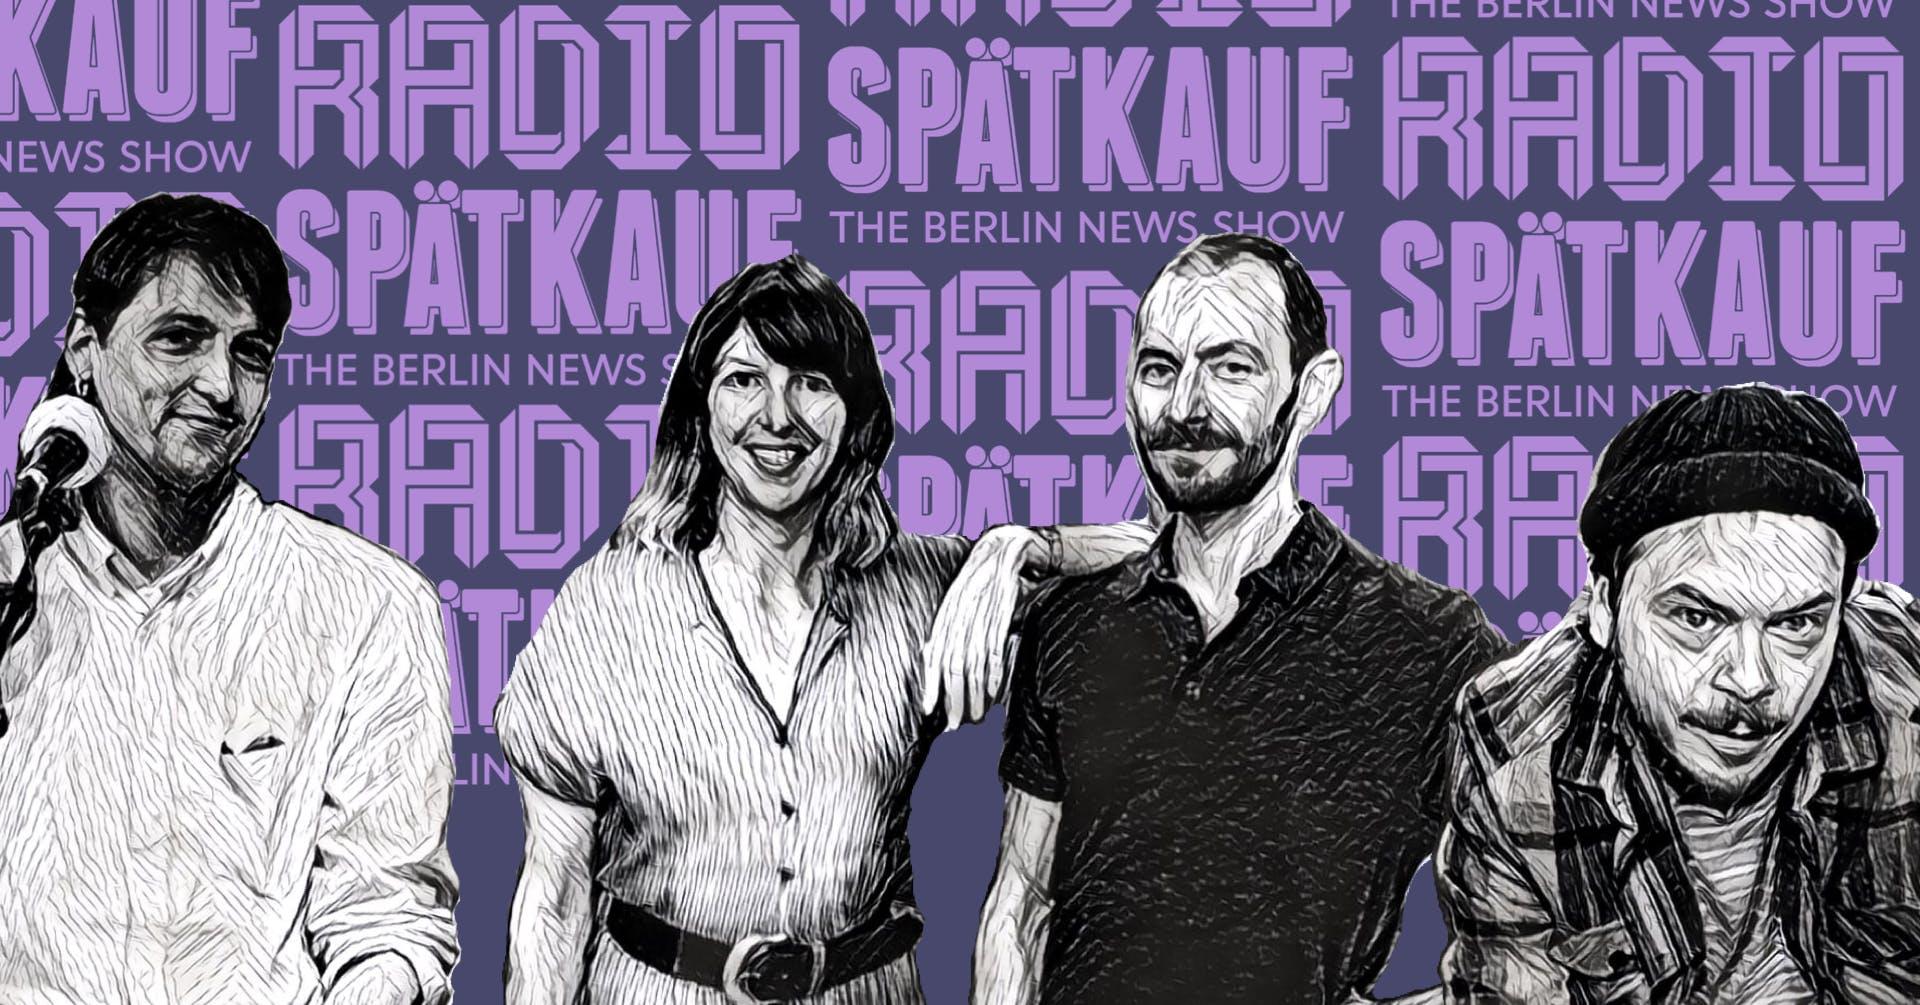 Radio Spaetkauf Podcast Recording February